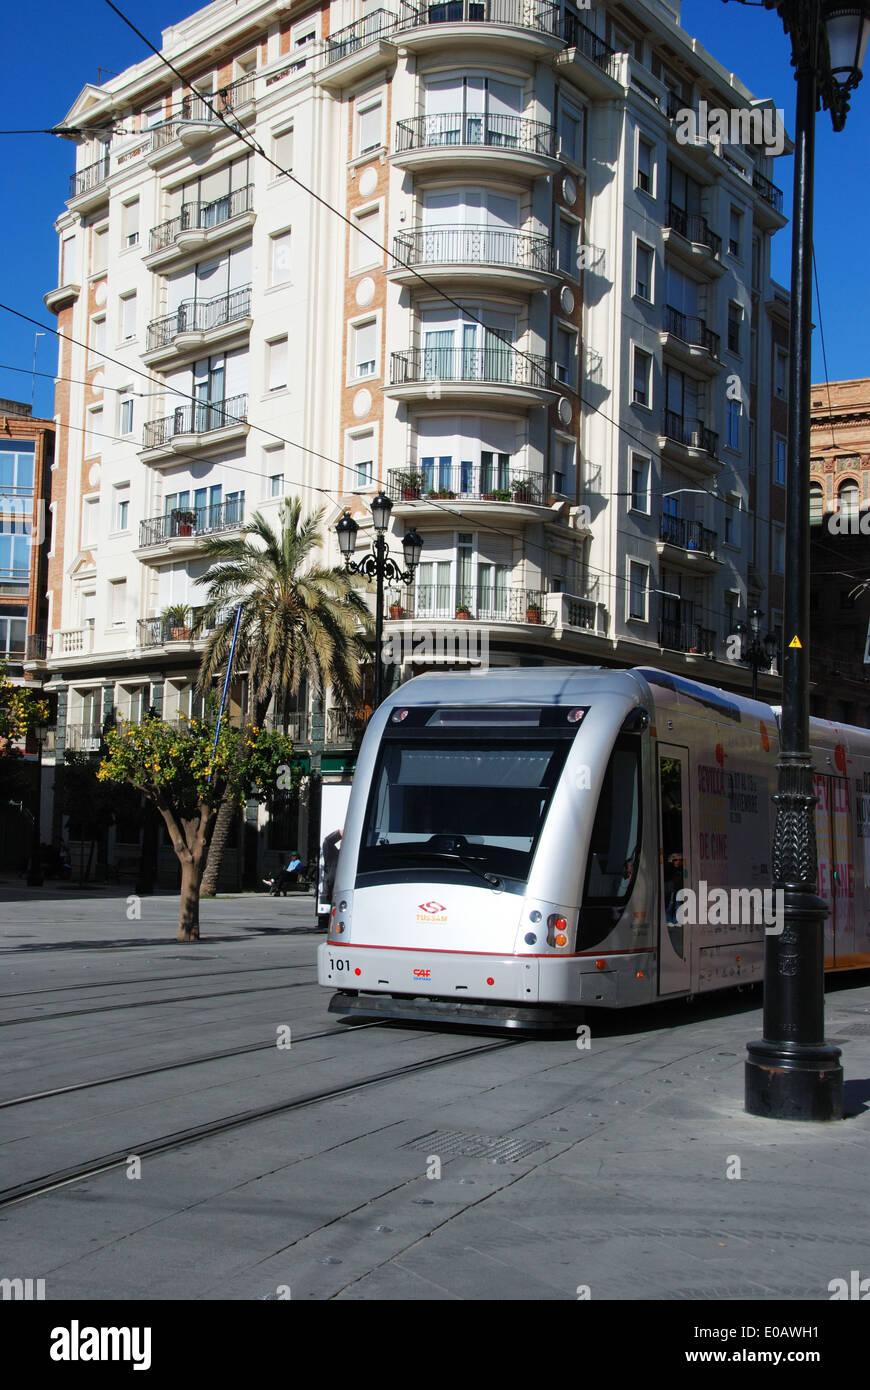 Spanish Tram Stock Photos Amp Spanish Tram Stock Images Alamy